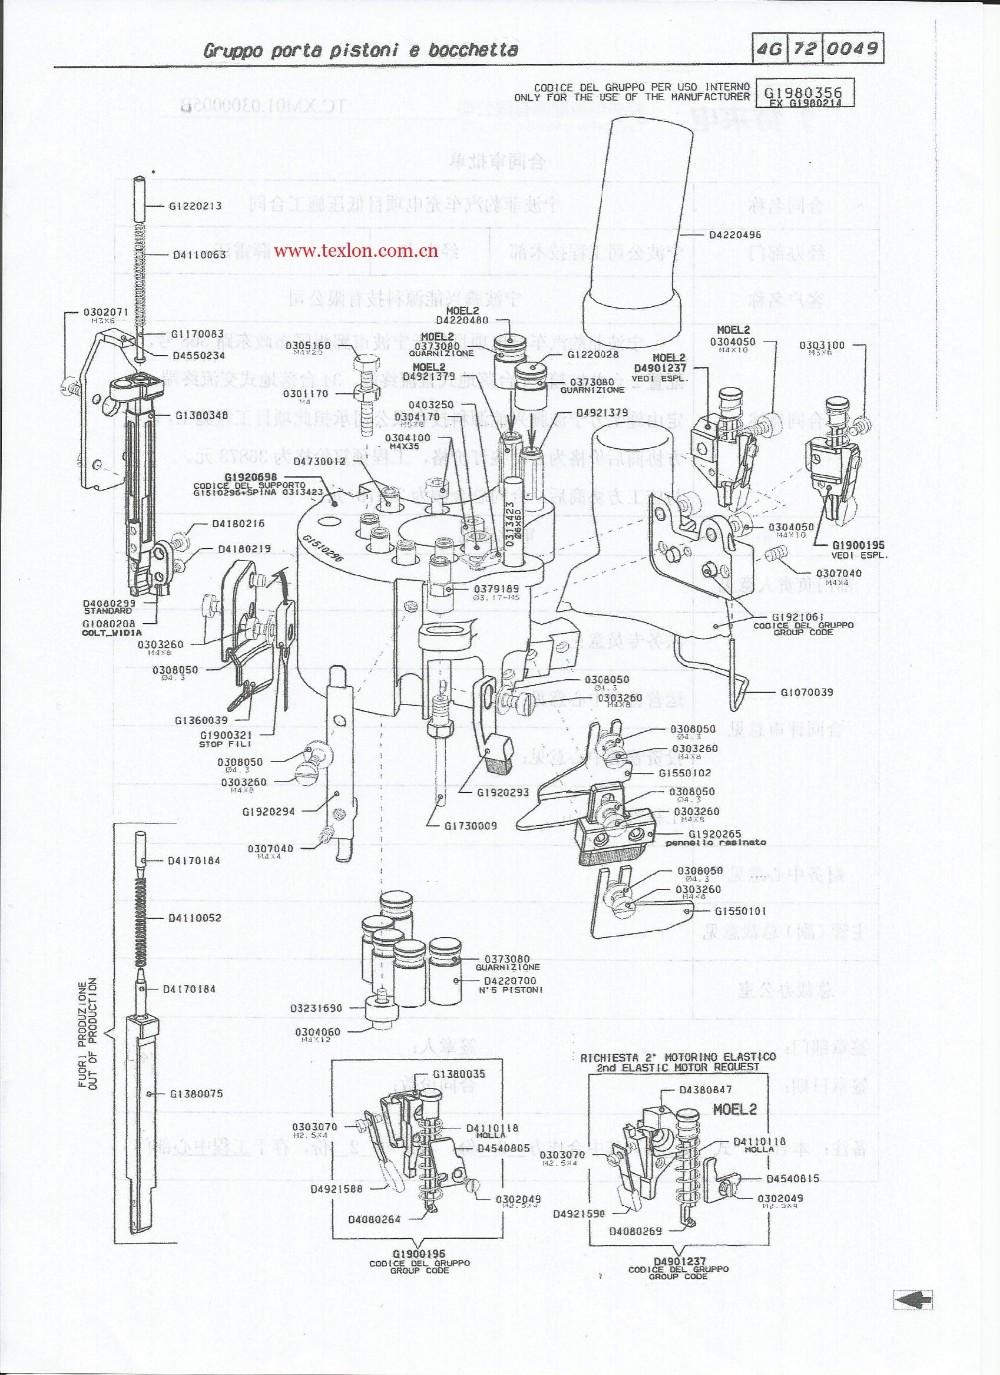 Buy Santoni G615L Man Sock Knitting Machine Use Elastic Knife Assembly G1900195 cheap